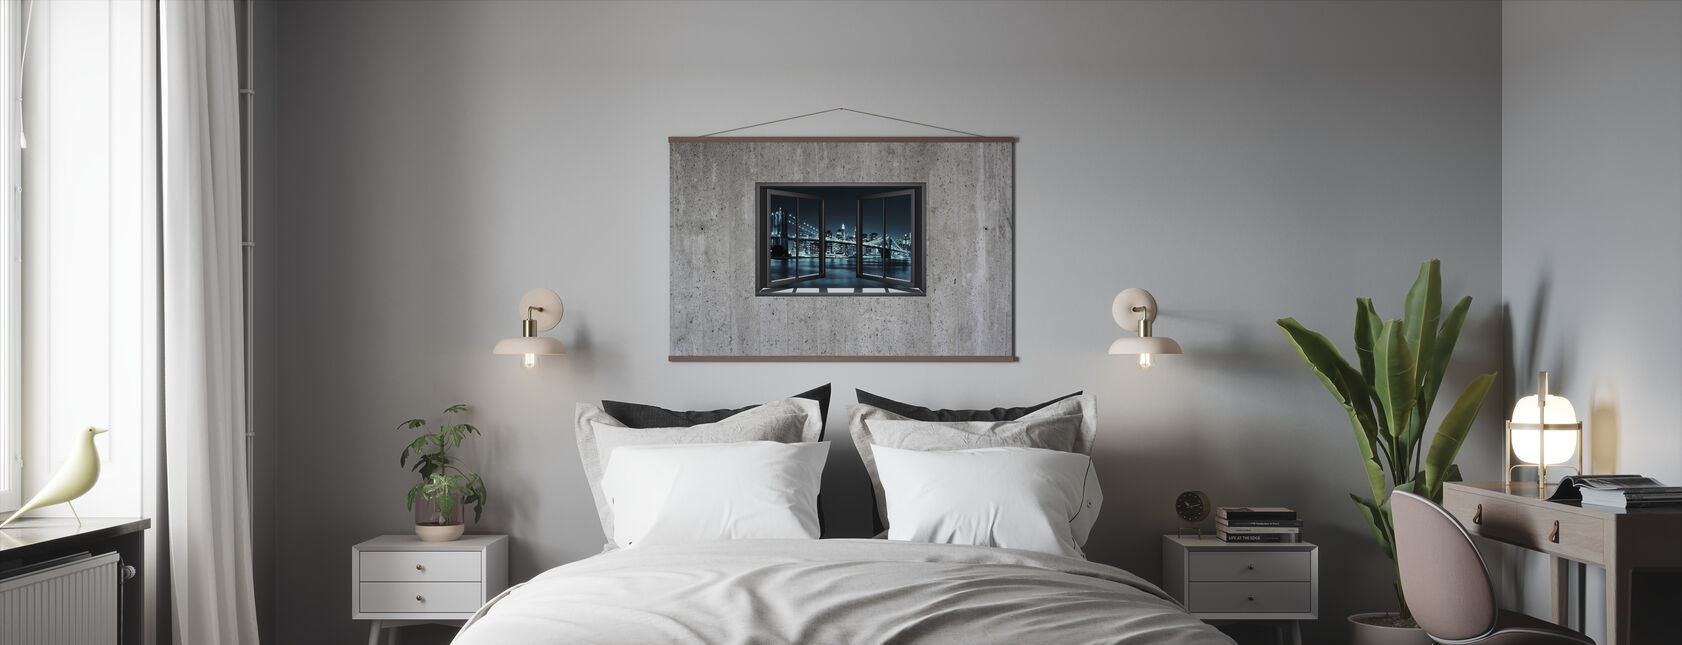 Window on Concrete Wall Brooklyn - Poster - Bedroom